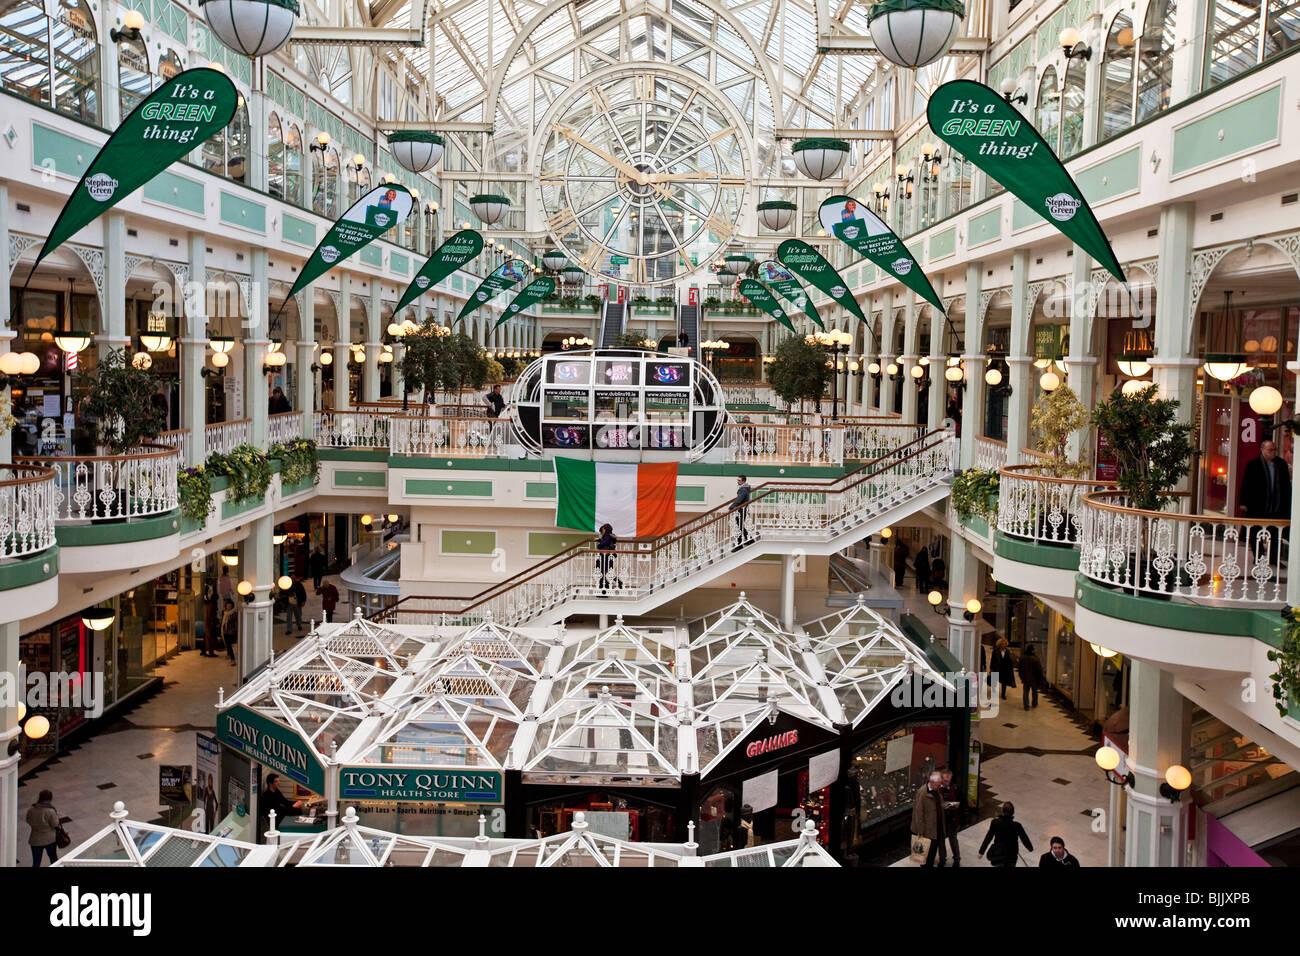 Shopping centre Dublin - Stock Image